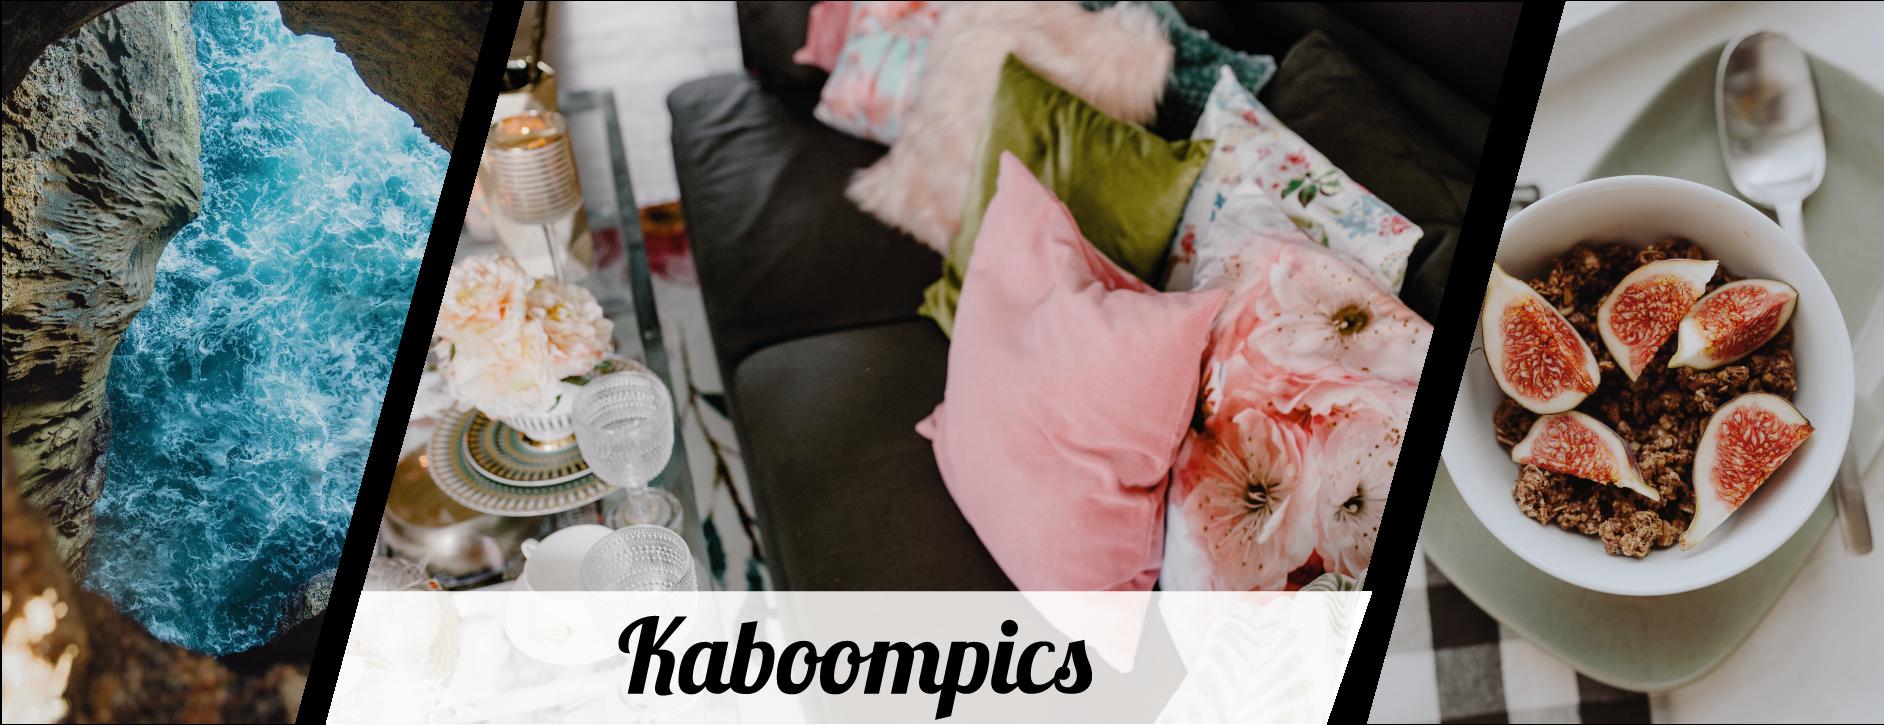 kaboompics image collage